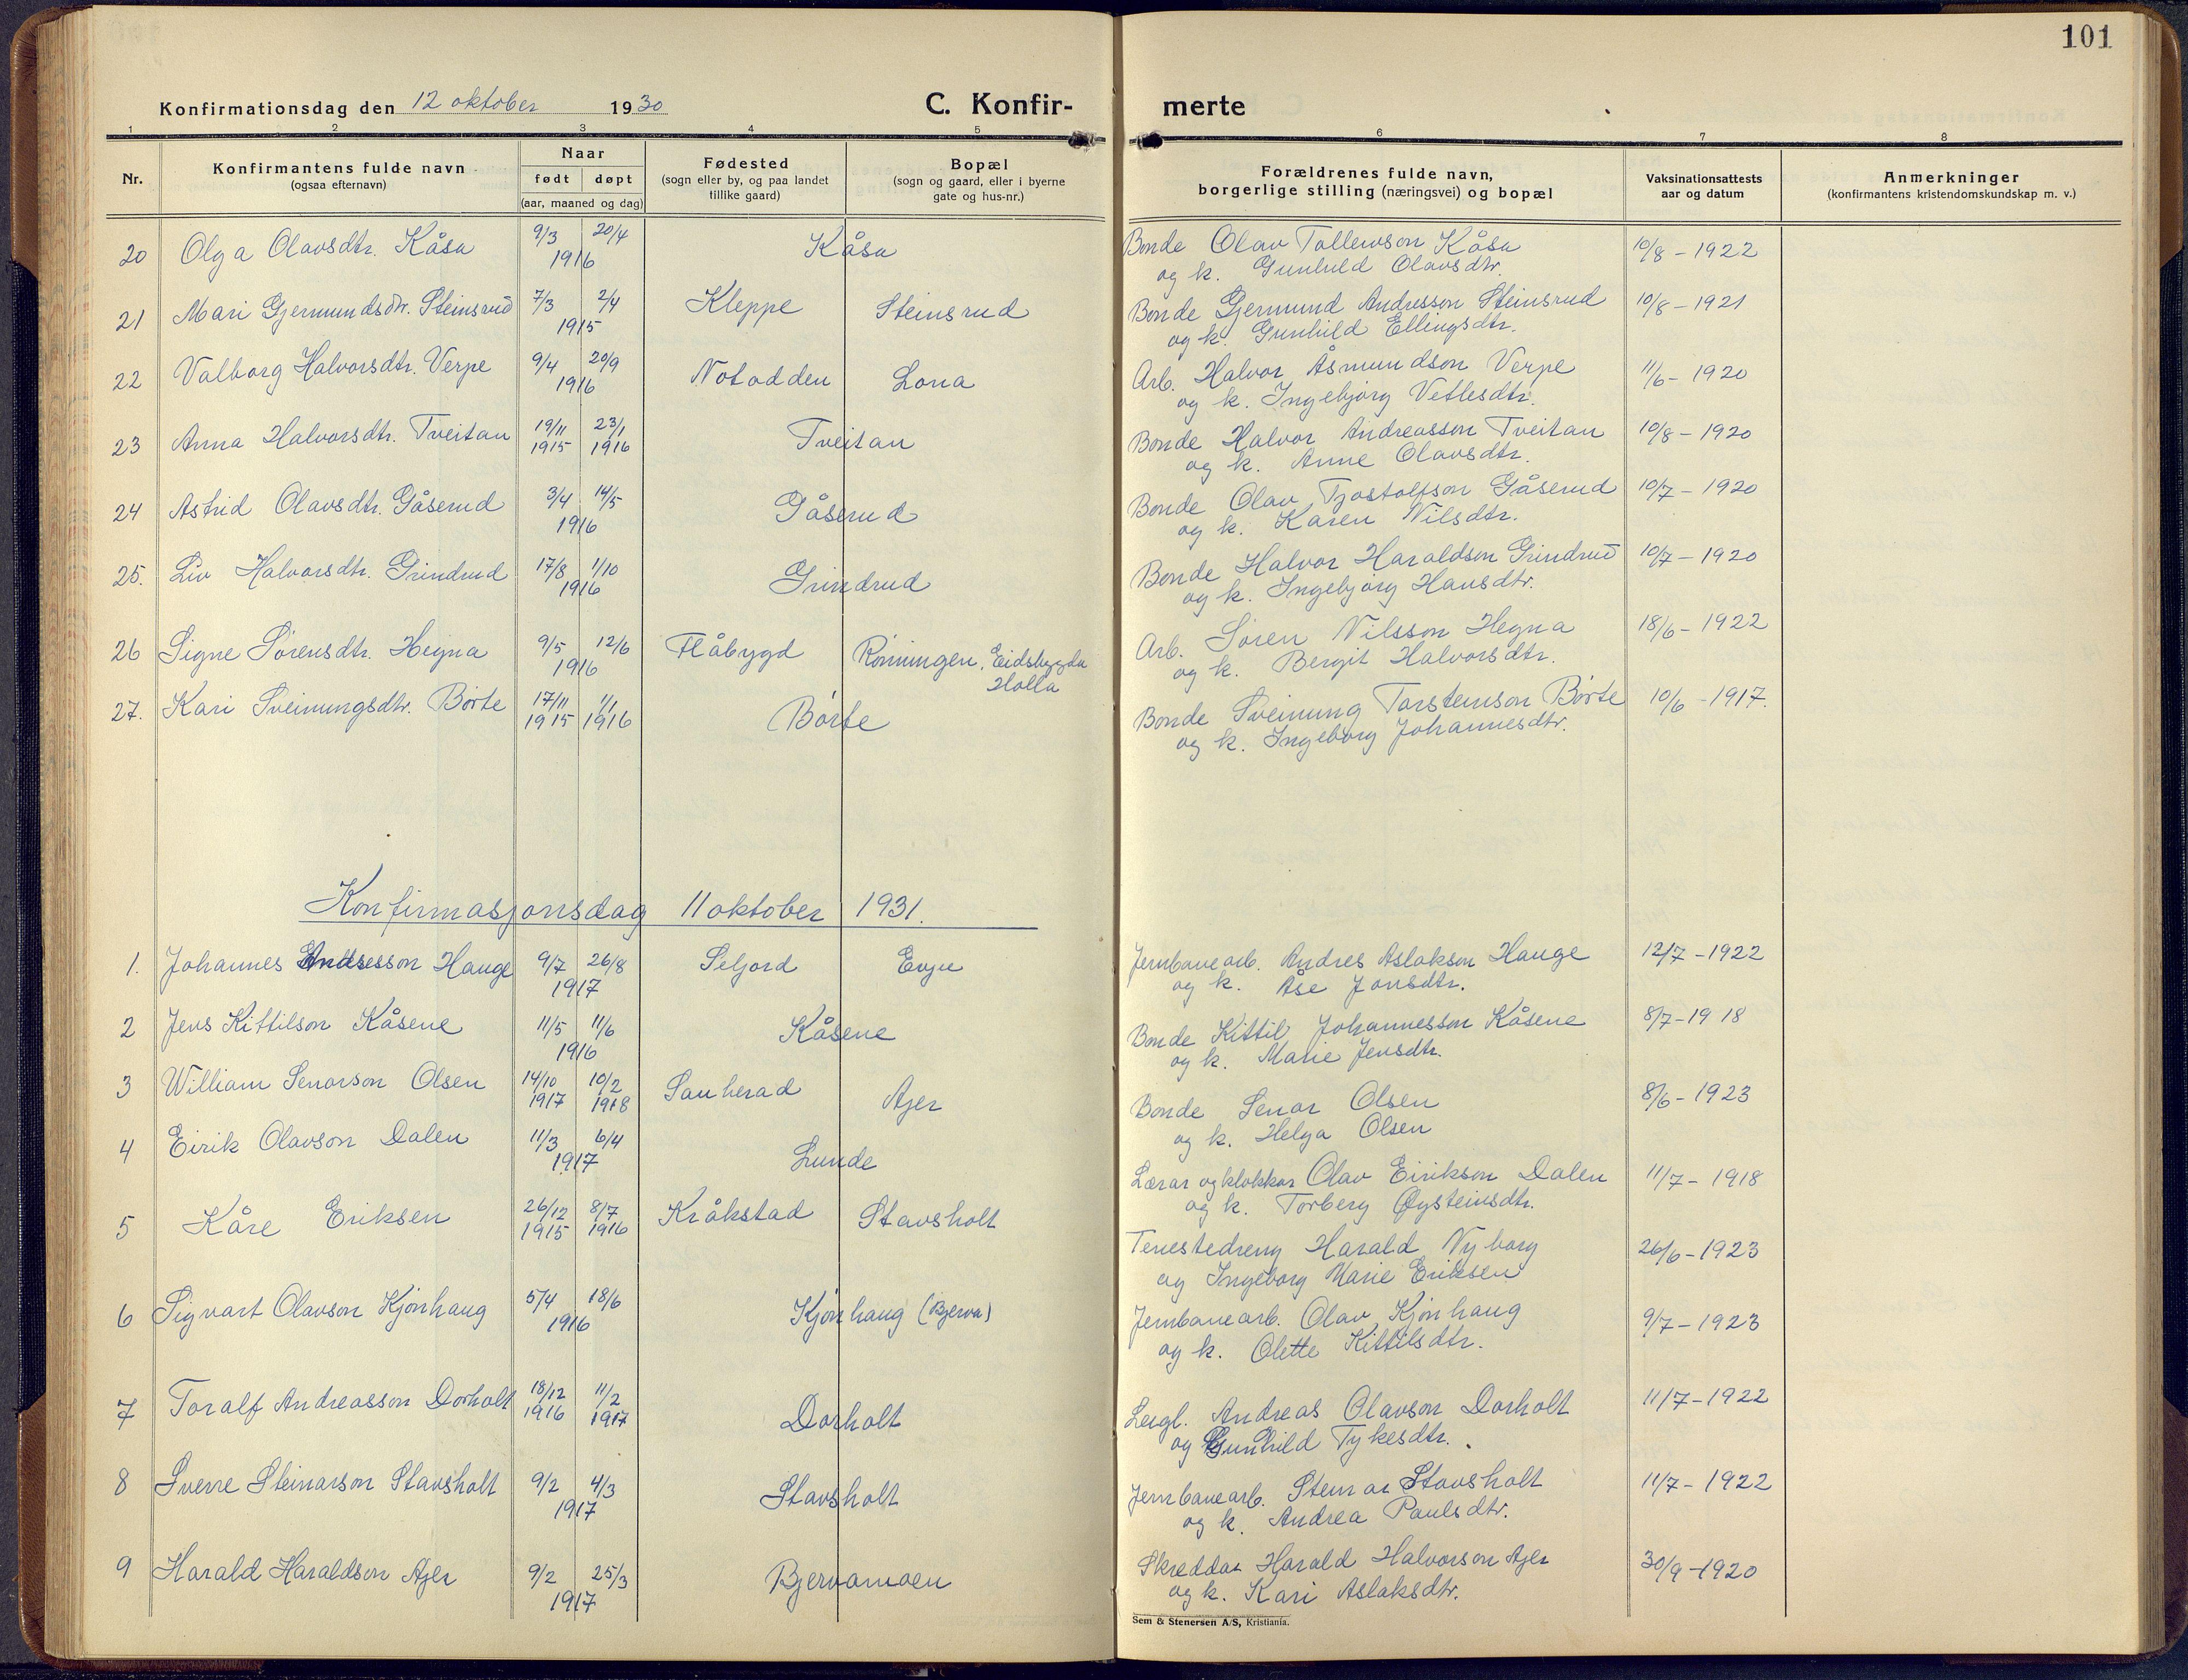 SAKO, Lunde kirkebøker, F/Fa/L0006: Ministerialbok nr. I 6, 1922-1940, s. 101